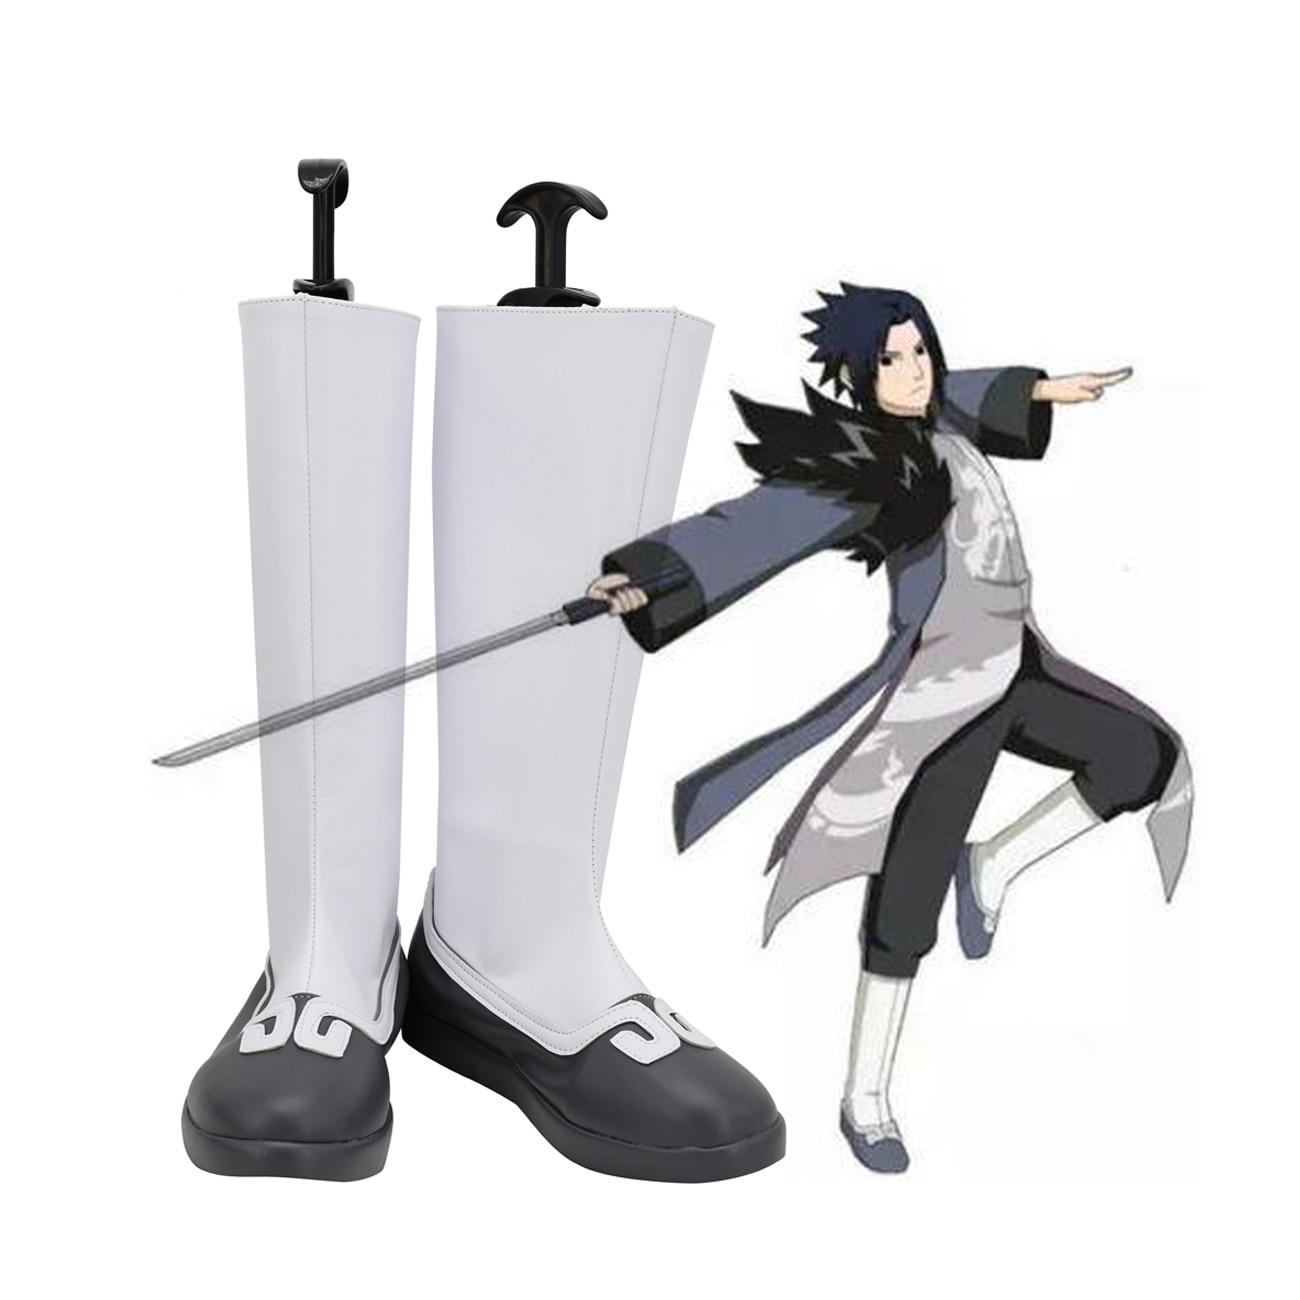 Naruto Sasuke Uchiha botas Cosplay zapatos blancos hechos a medida cualquier tamaño para Halloween Comic-con accesorios Cosplay